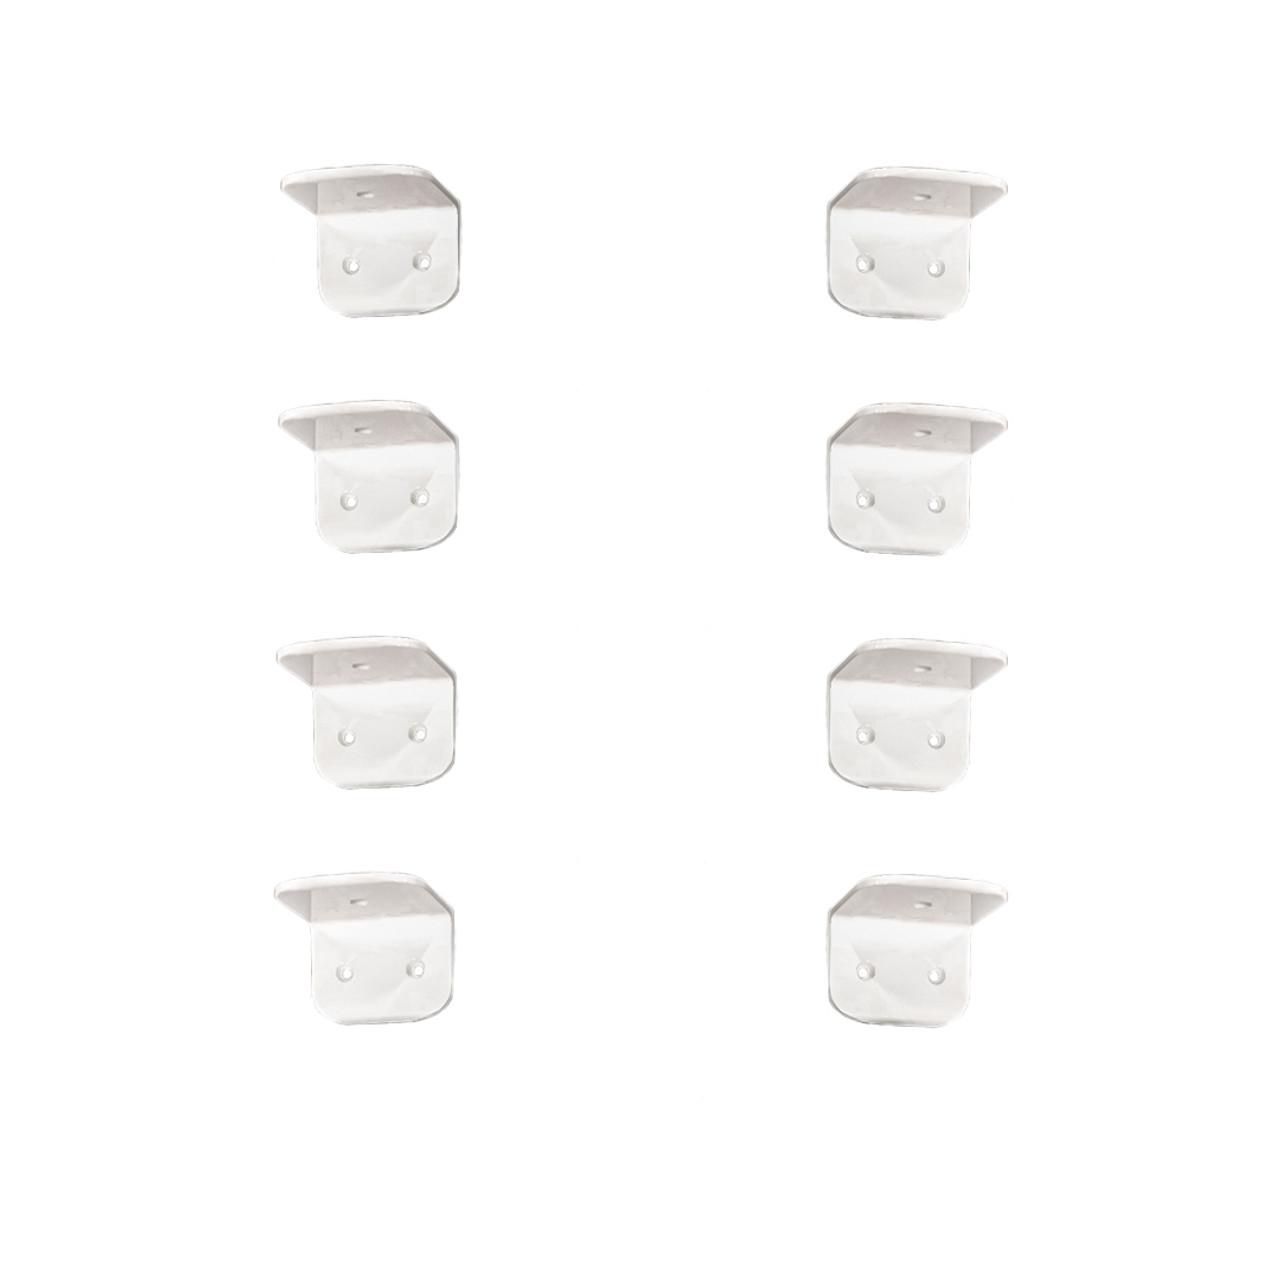 Aluminum Powder Coated Chocks: F380 & F400